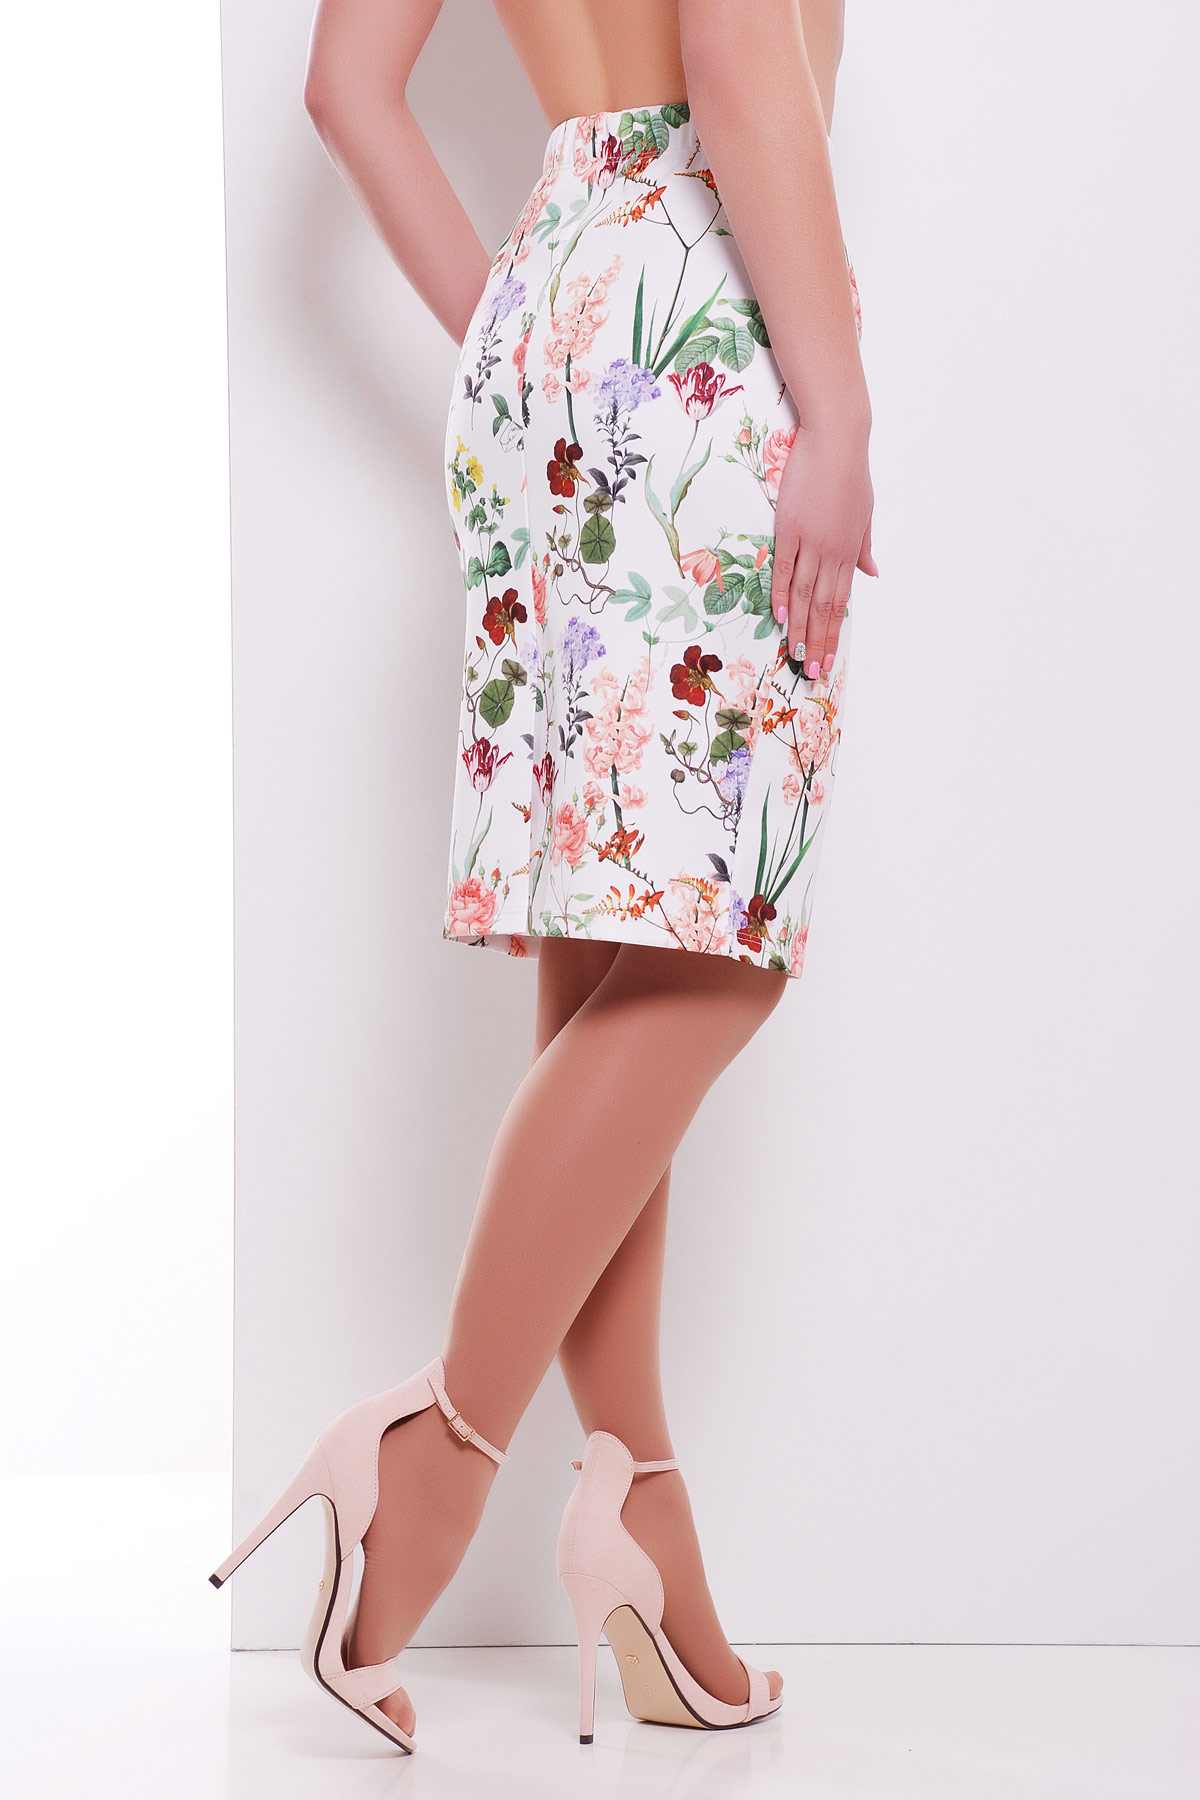 юбка-карандаш с цветами. Цветочки юбка мод. №14 Оригами. Цвет: принт